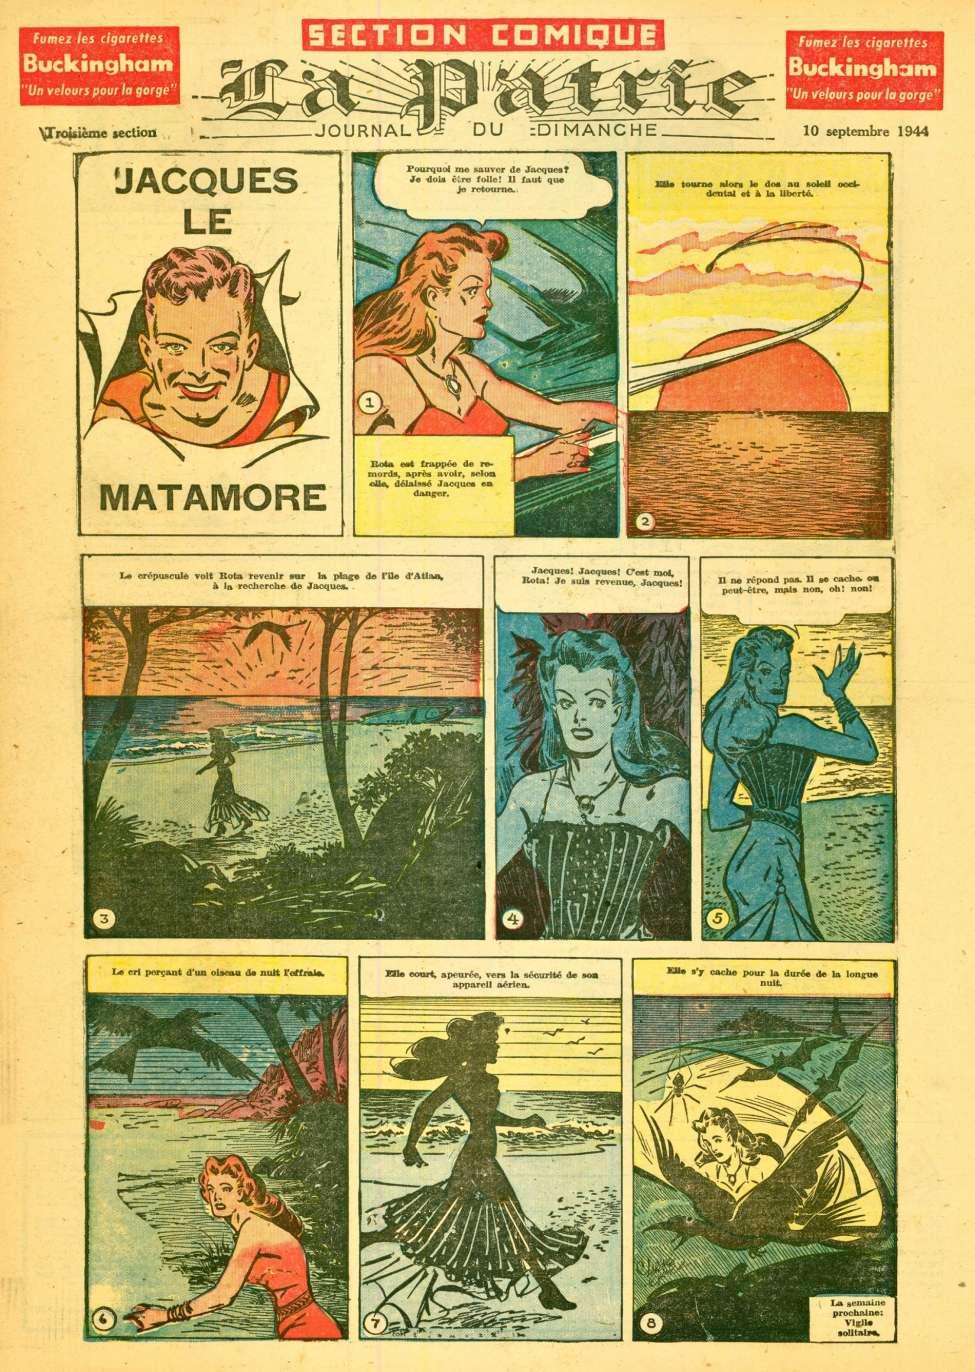 Comic Book Cover For La Patrie - Section Comique (1944-09-10)